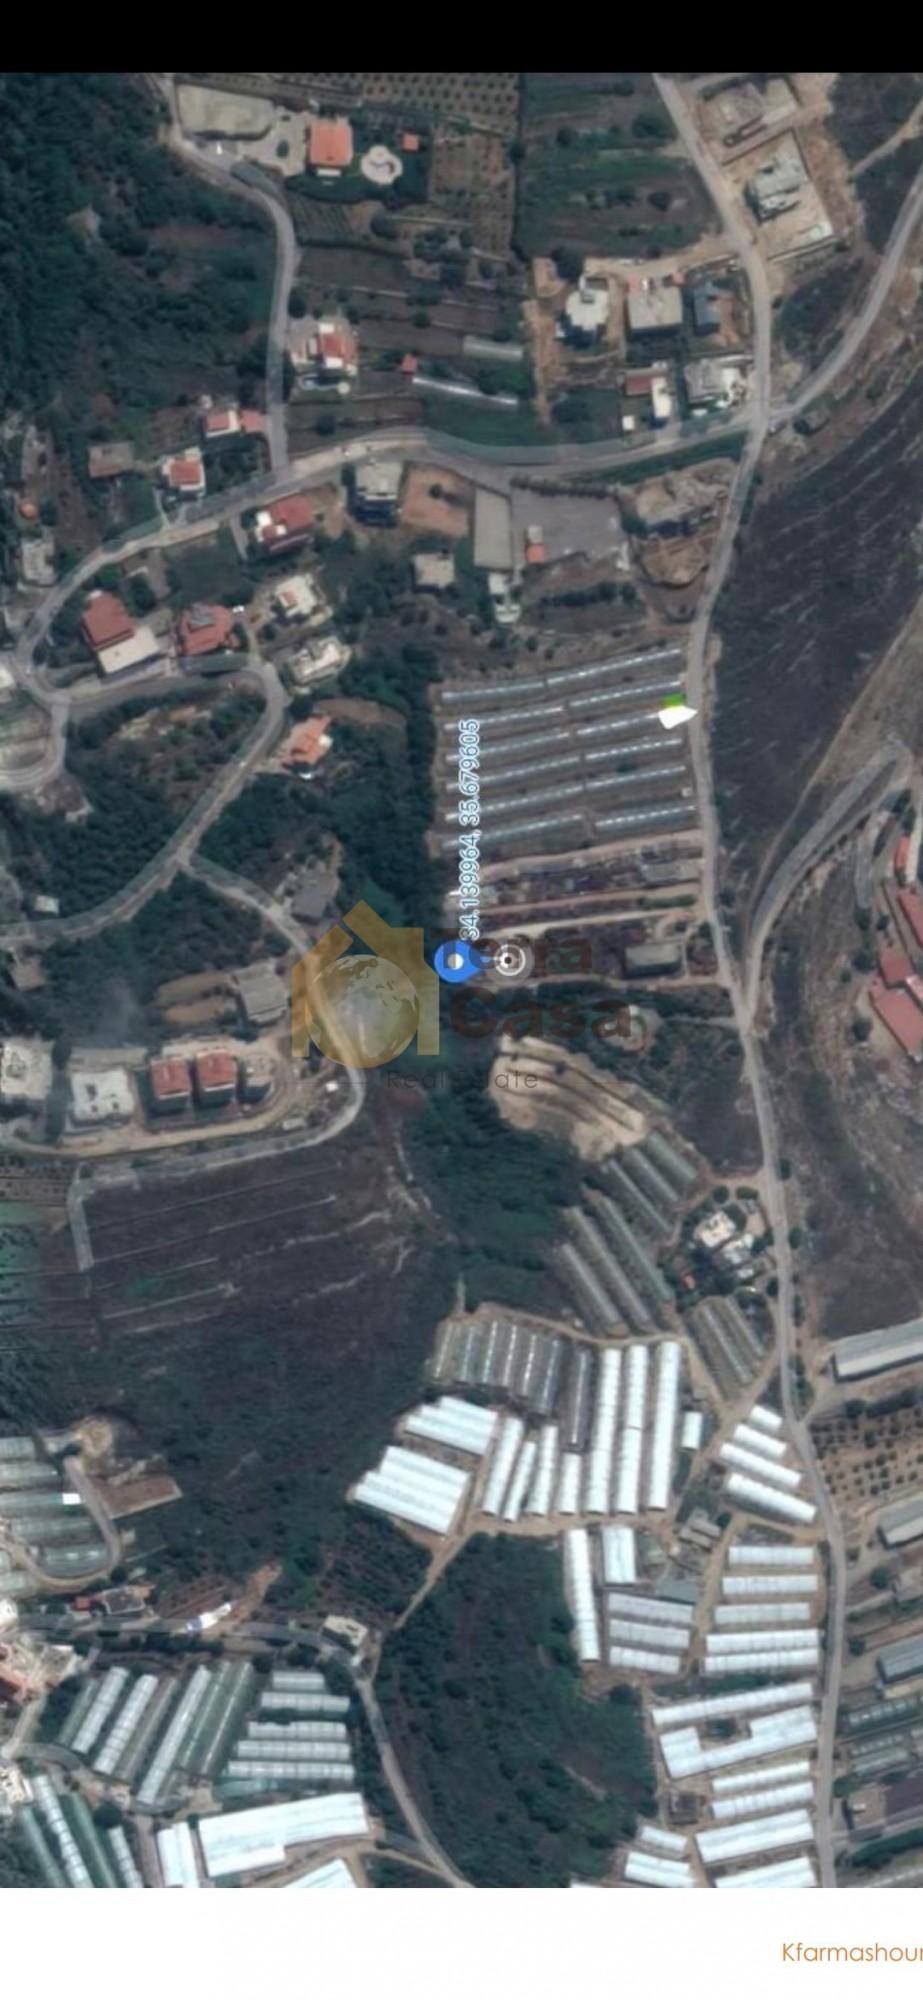 land for sale in edde kfarmashoun banker cheque .